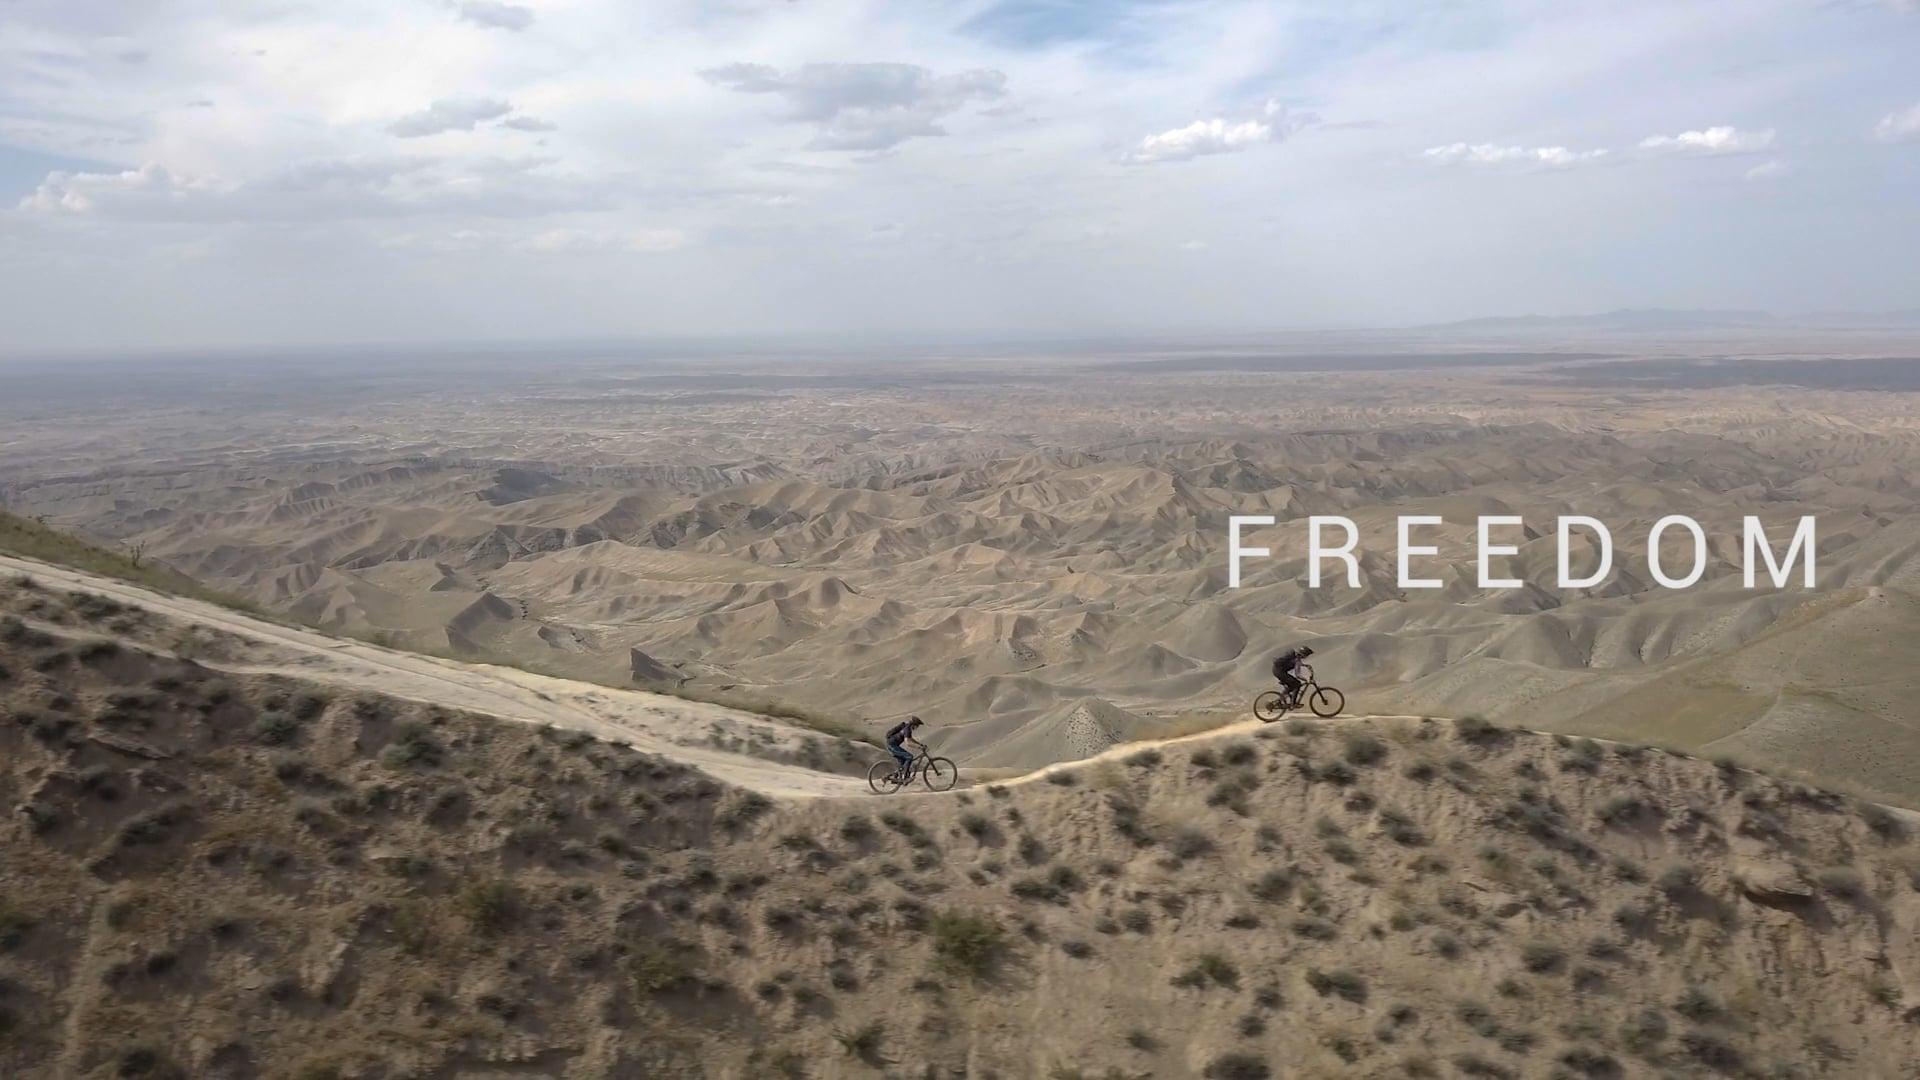 FREE RIDING IRAN - Trailer